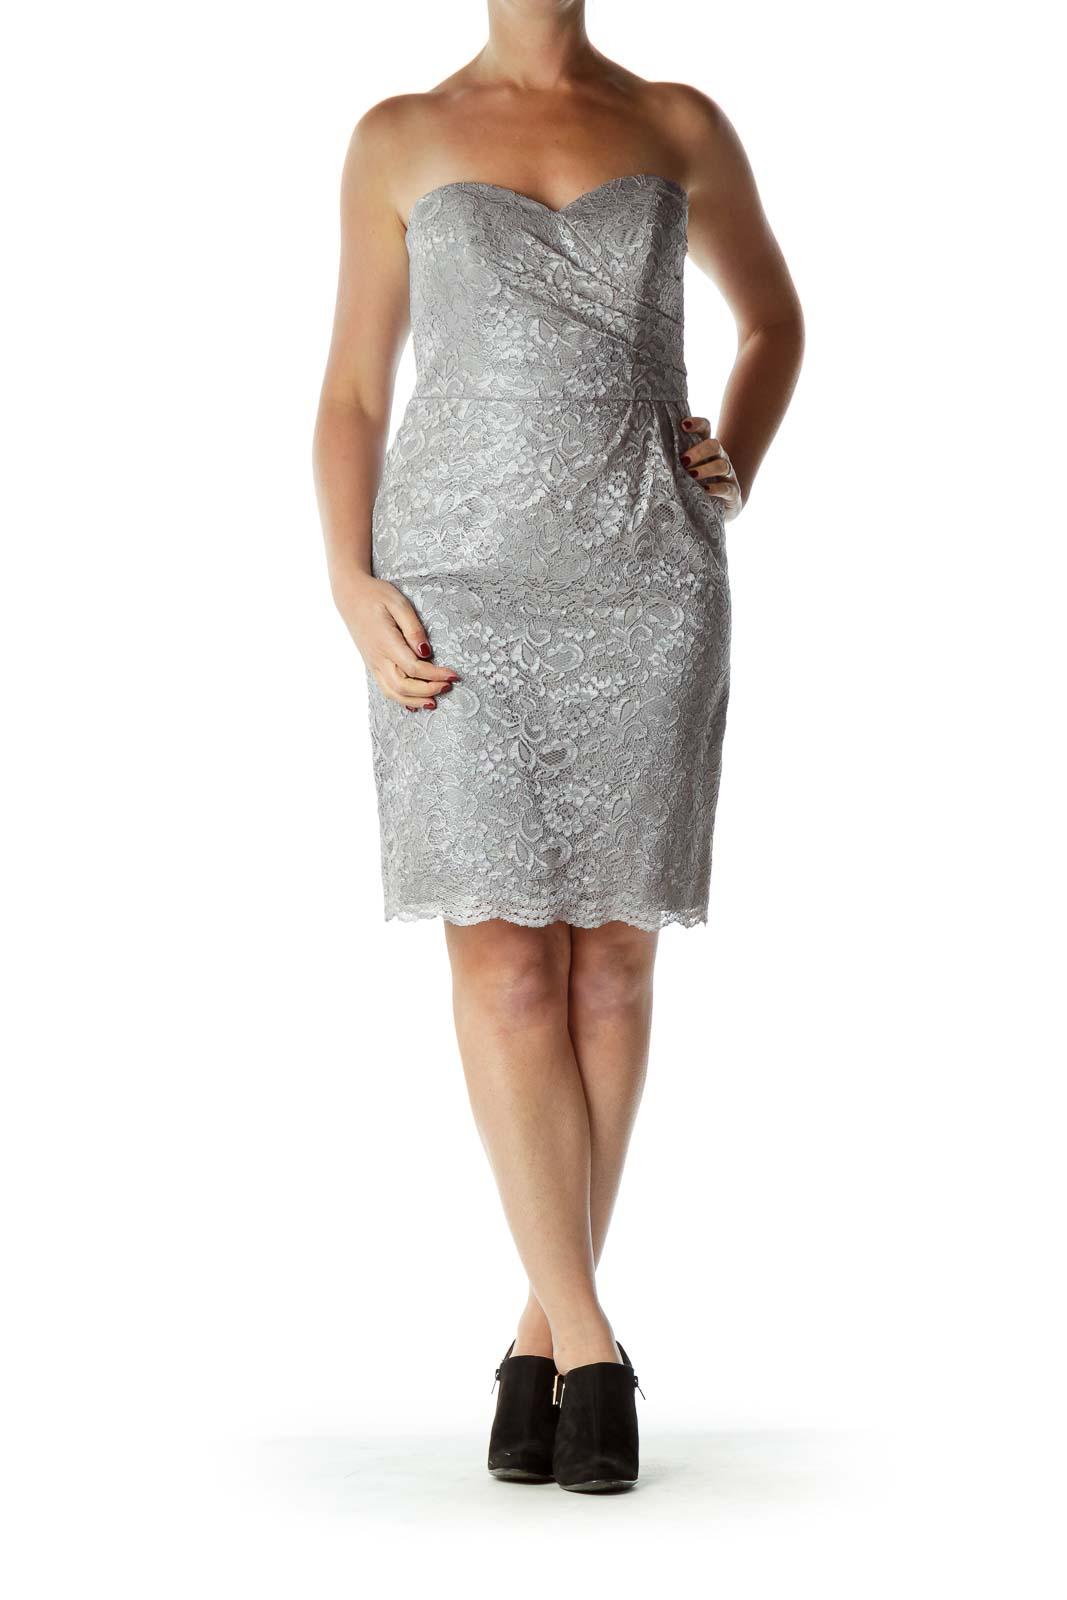 Beige Lace Sweetheart Neck Cocktail Dresss